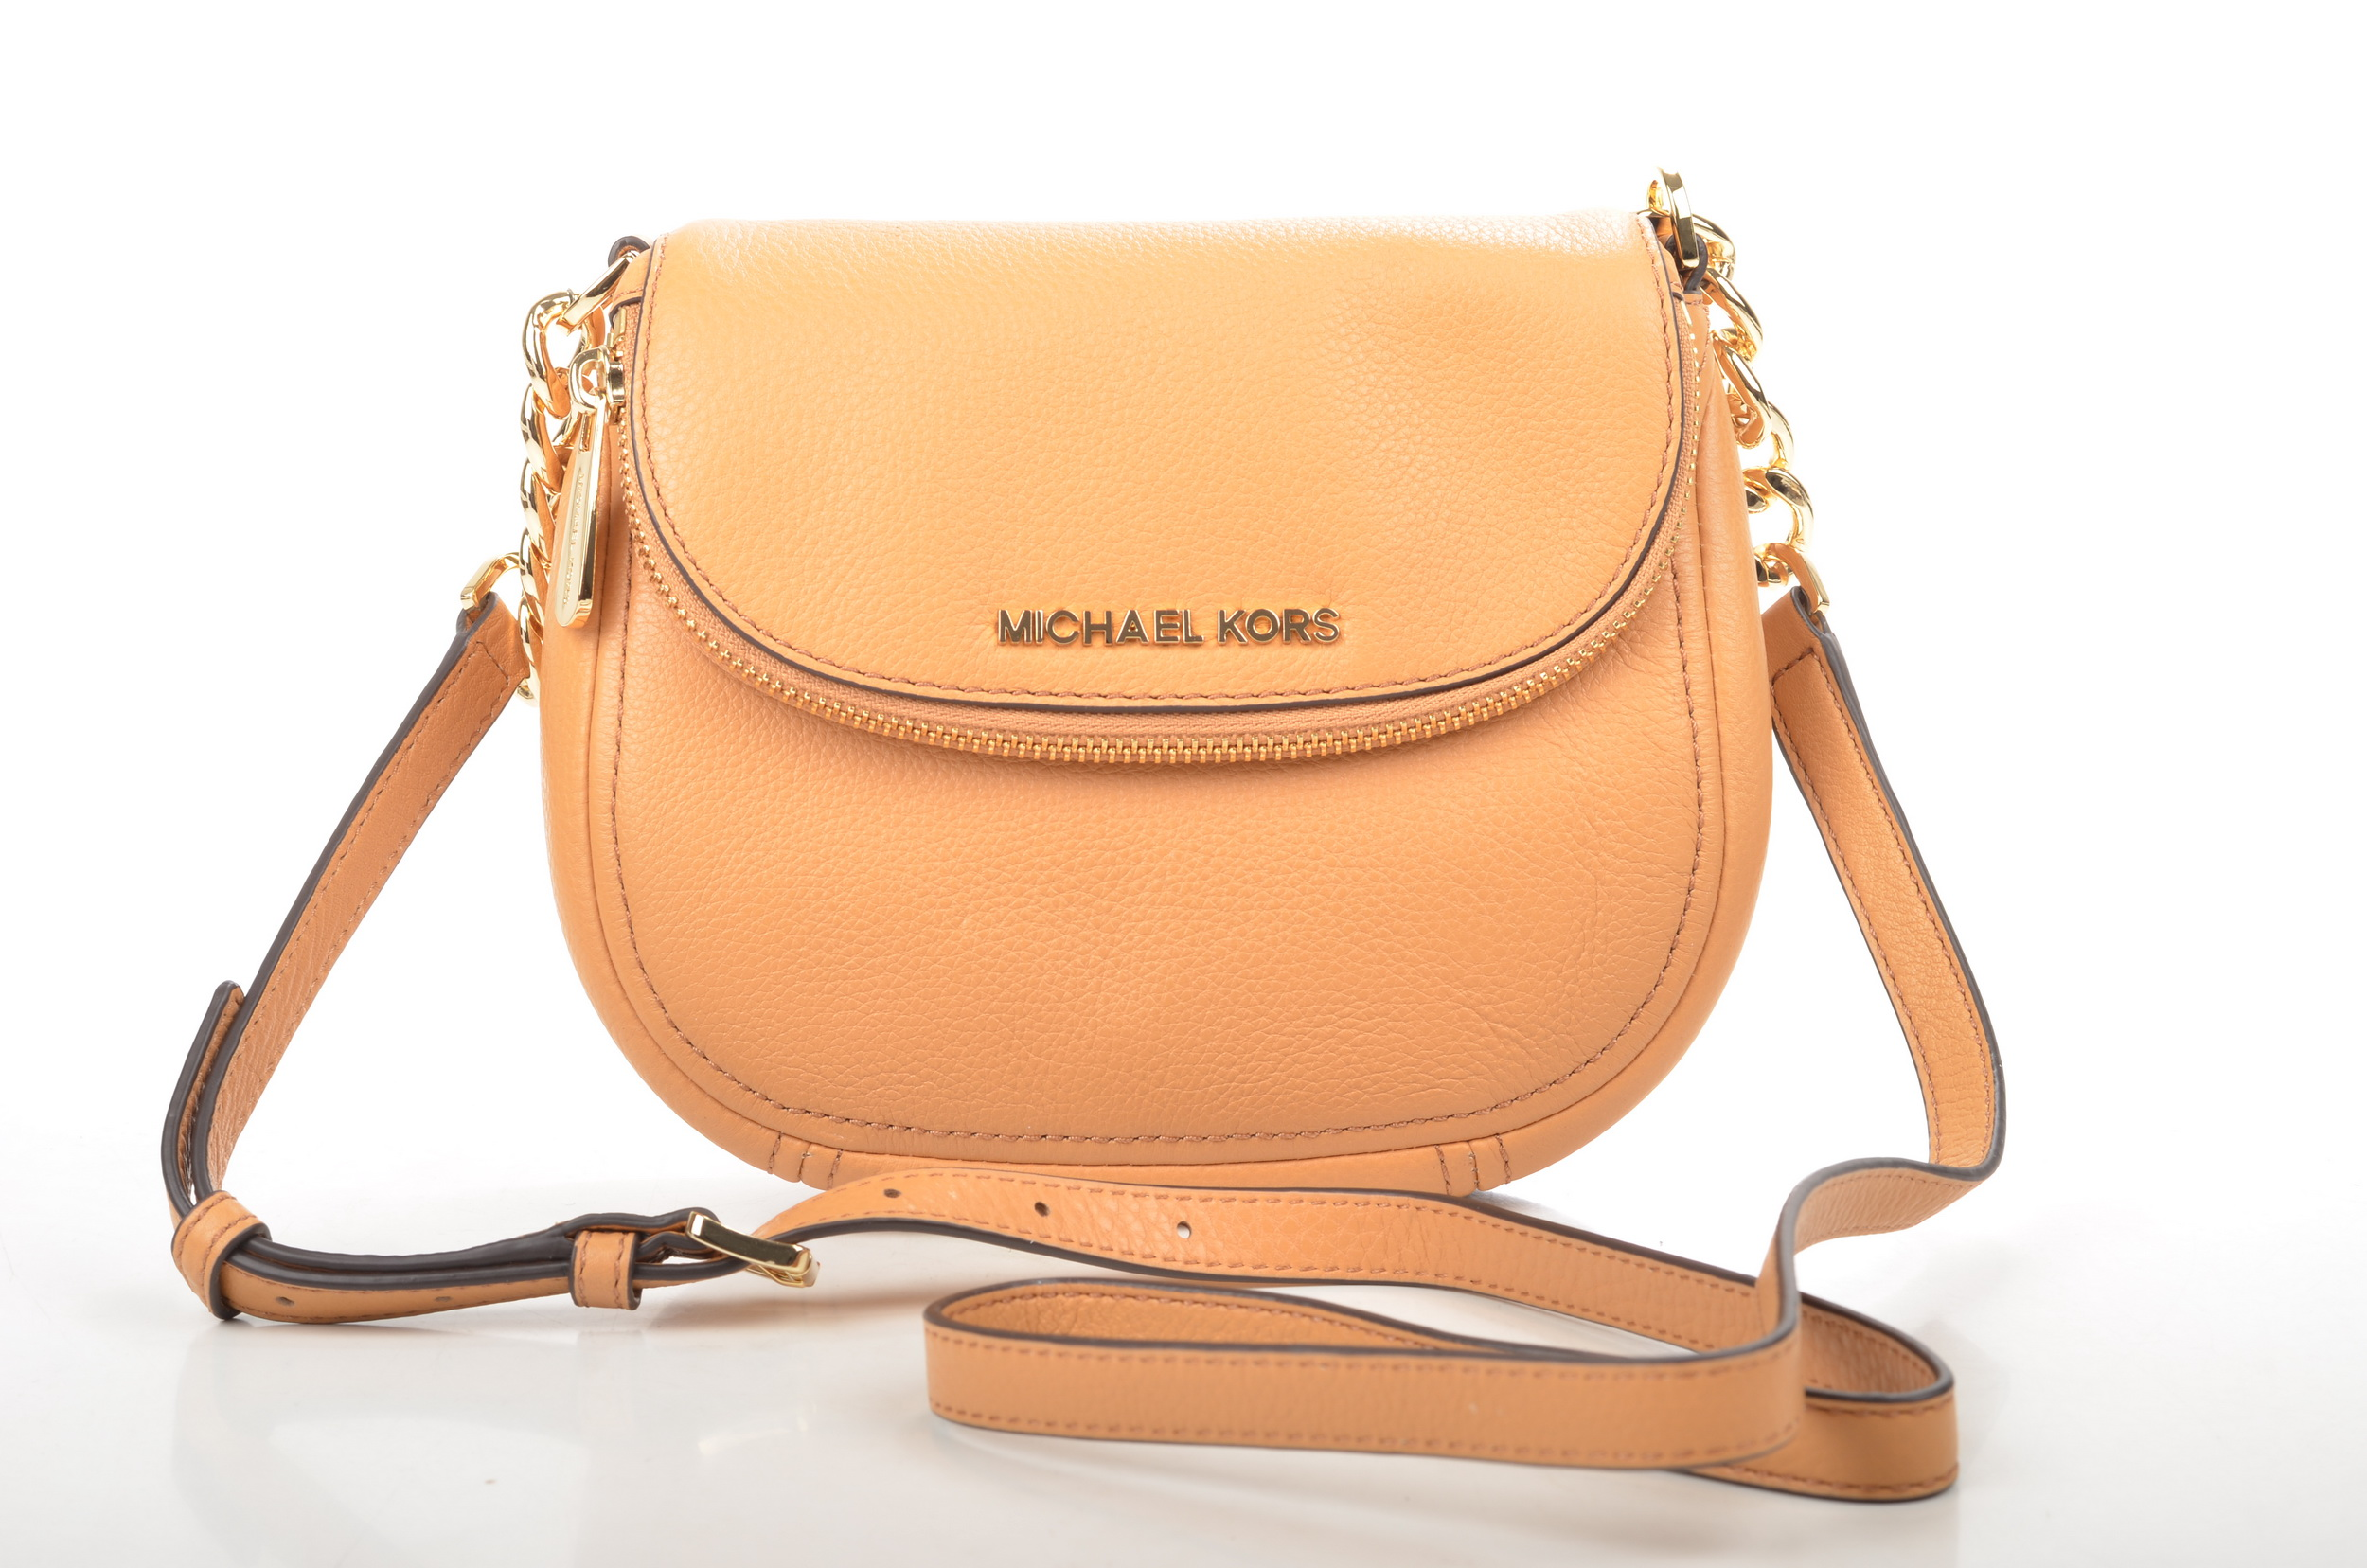 Michael Kors Leather Flat Shoes